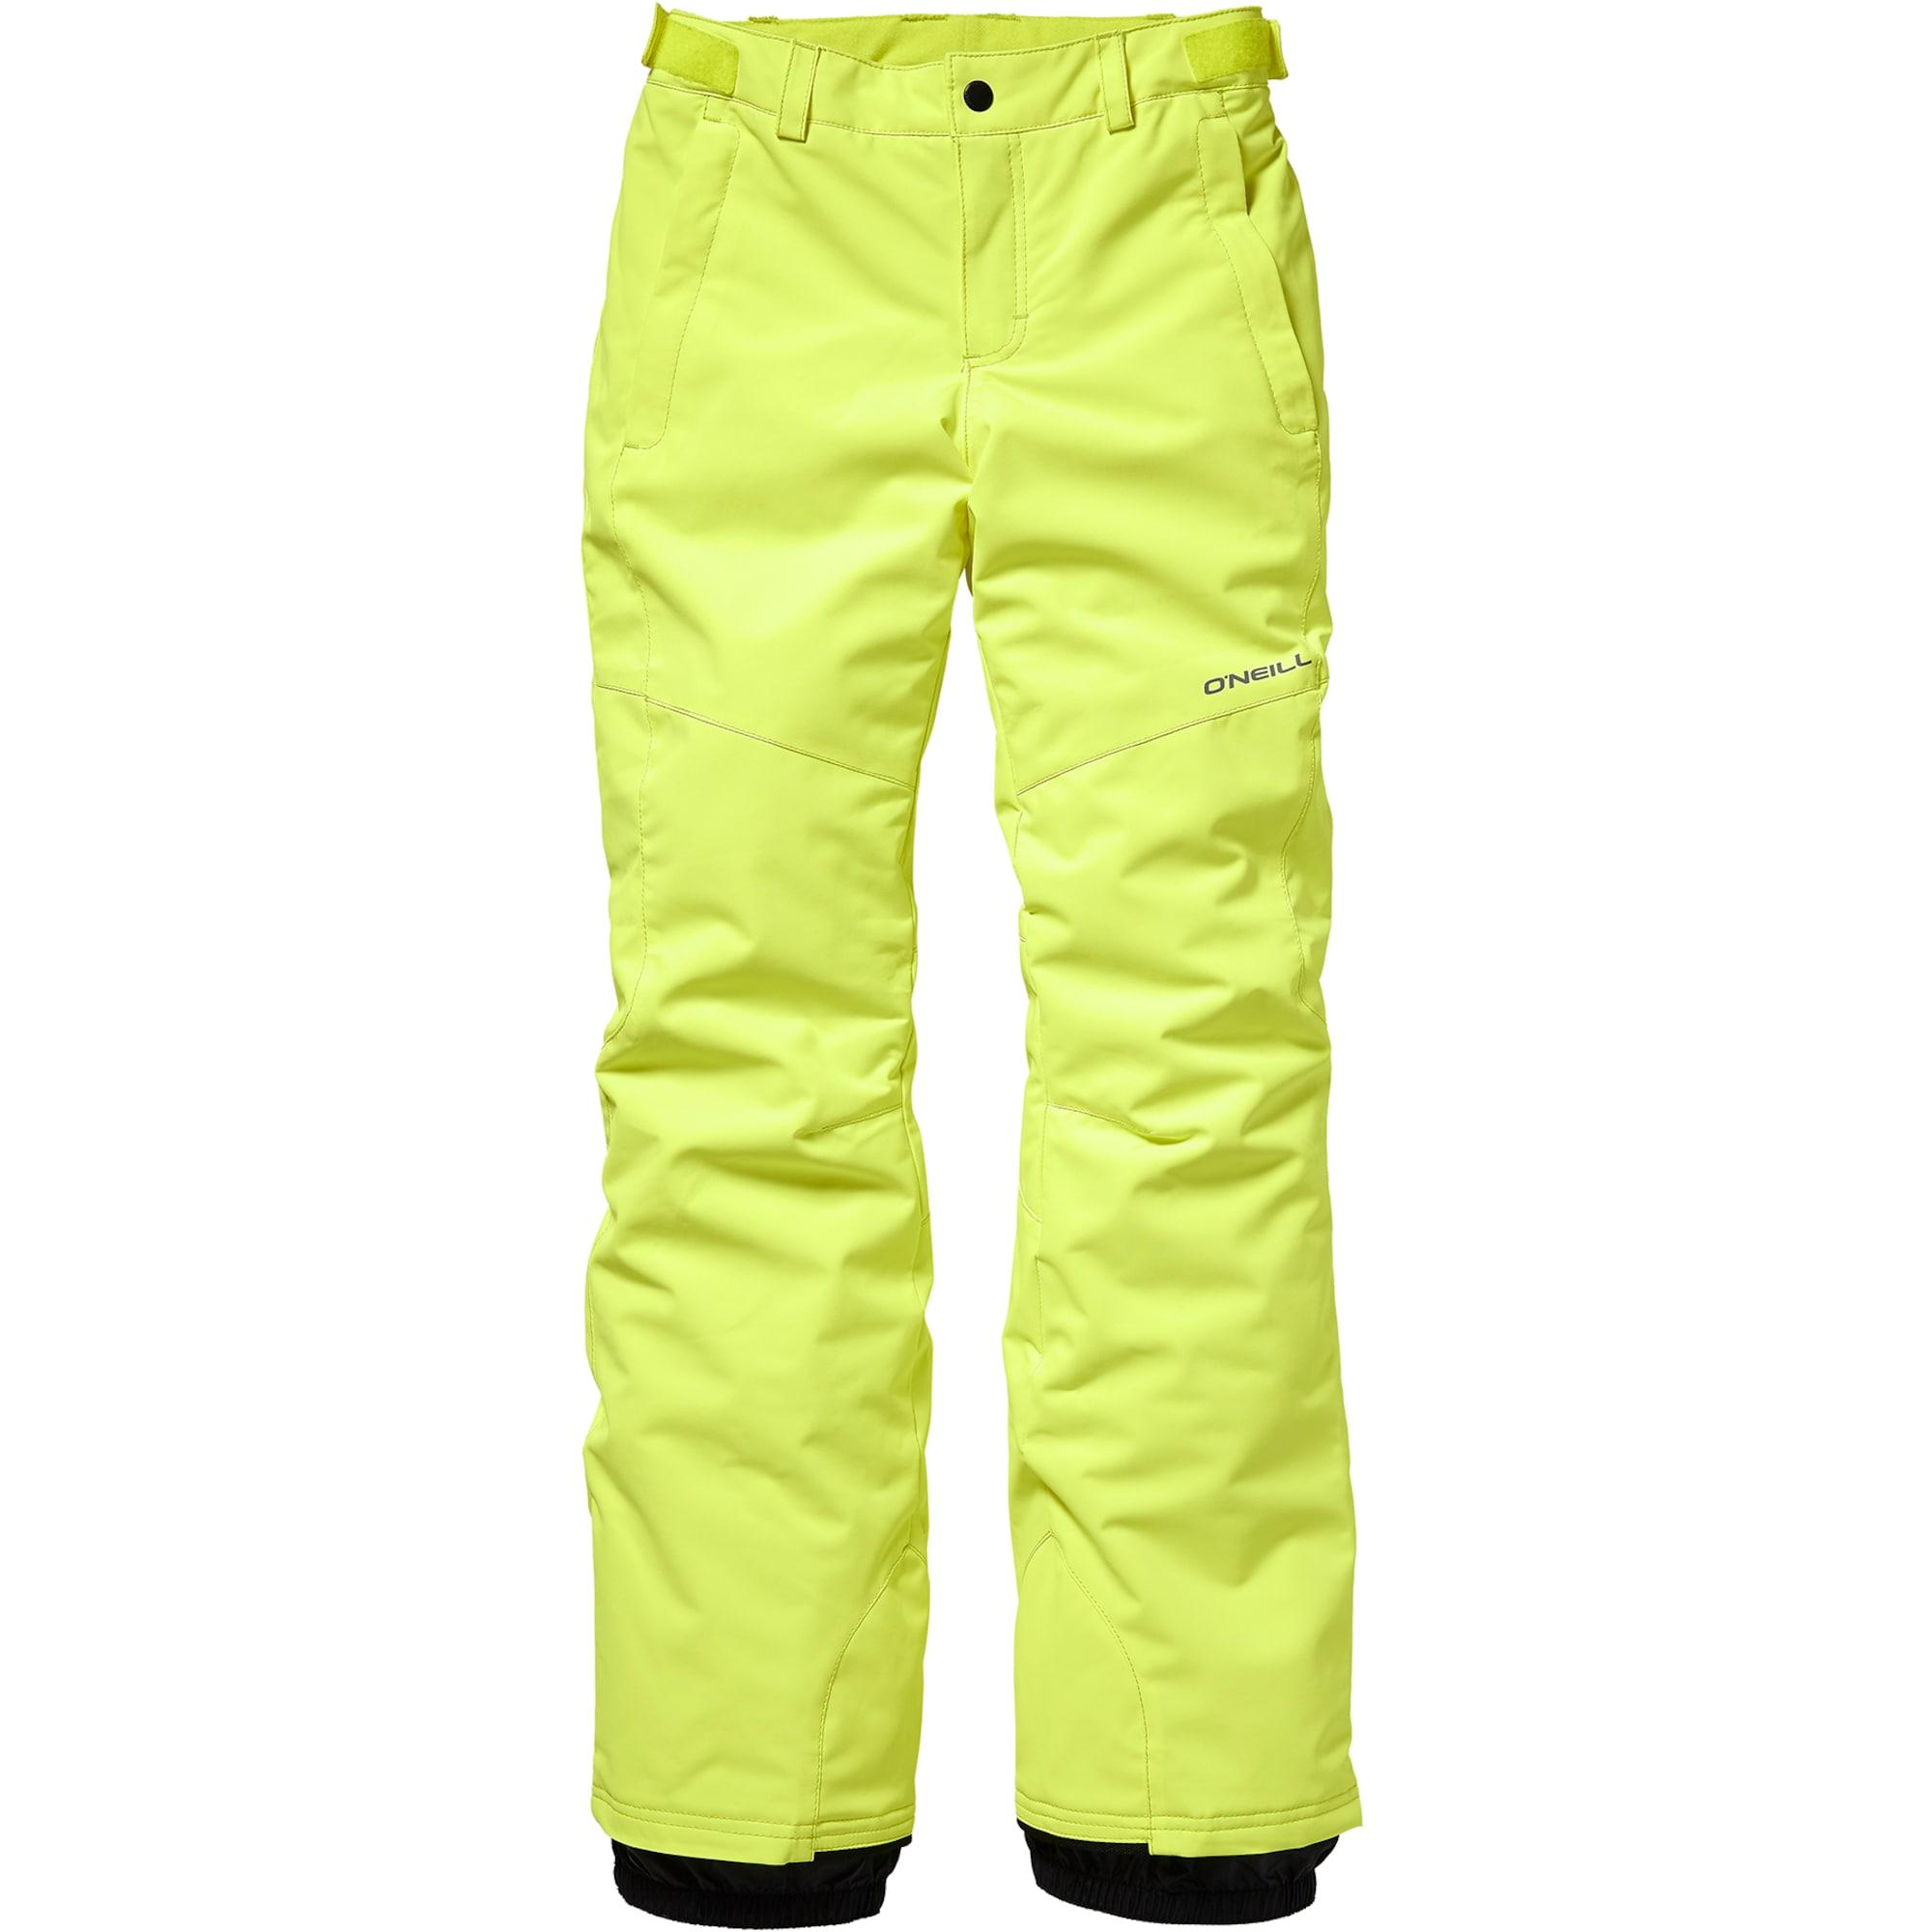 ONEILL Outdoorové kalhoty PG CHARM PANTS limone O'NEILL